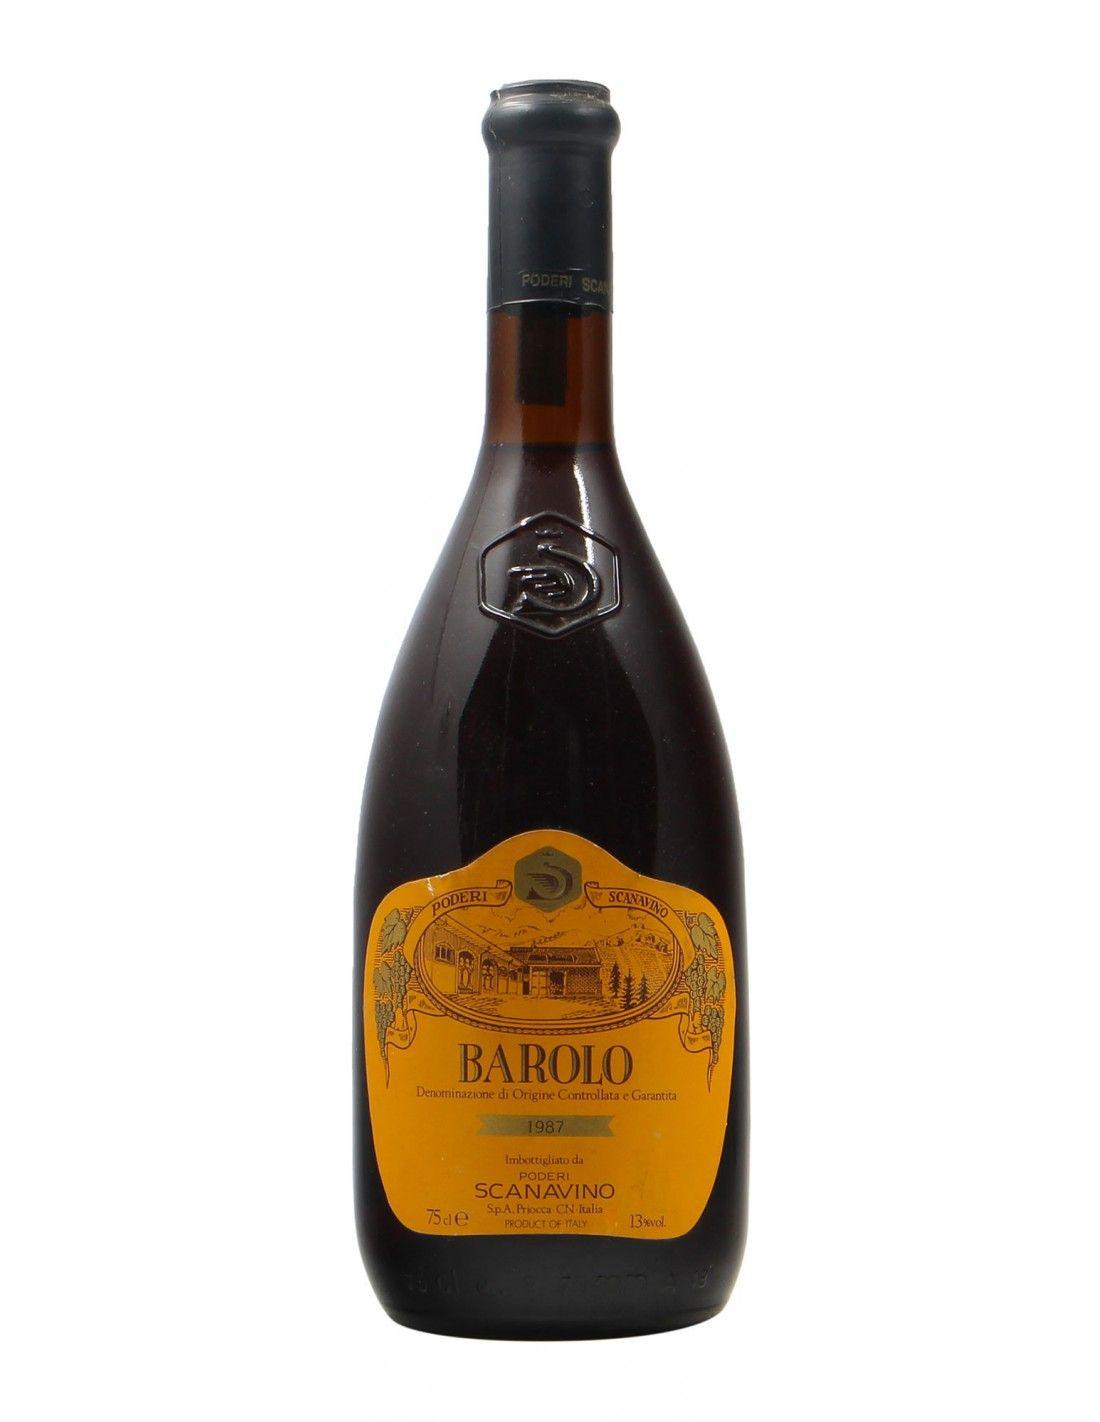 Barolo 1987 SCANAVINO GRANDI BOTTIGLIE